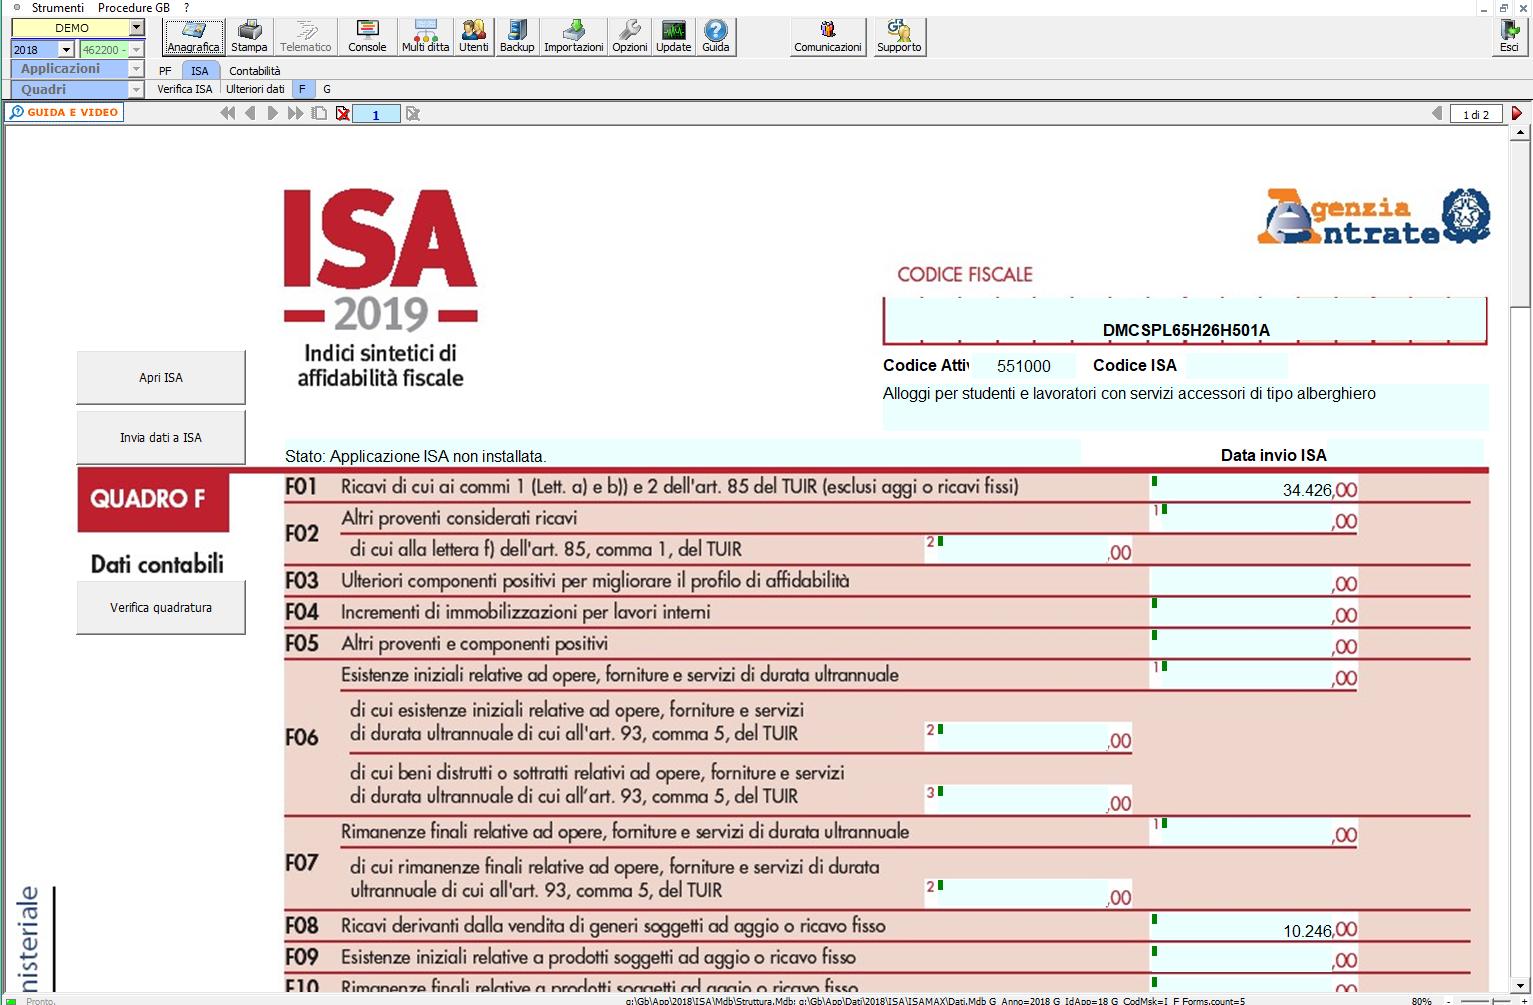 Software ISA 2019 (Indici sintetici affidabilità fiscale)